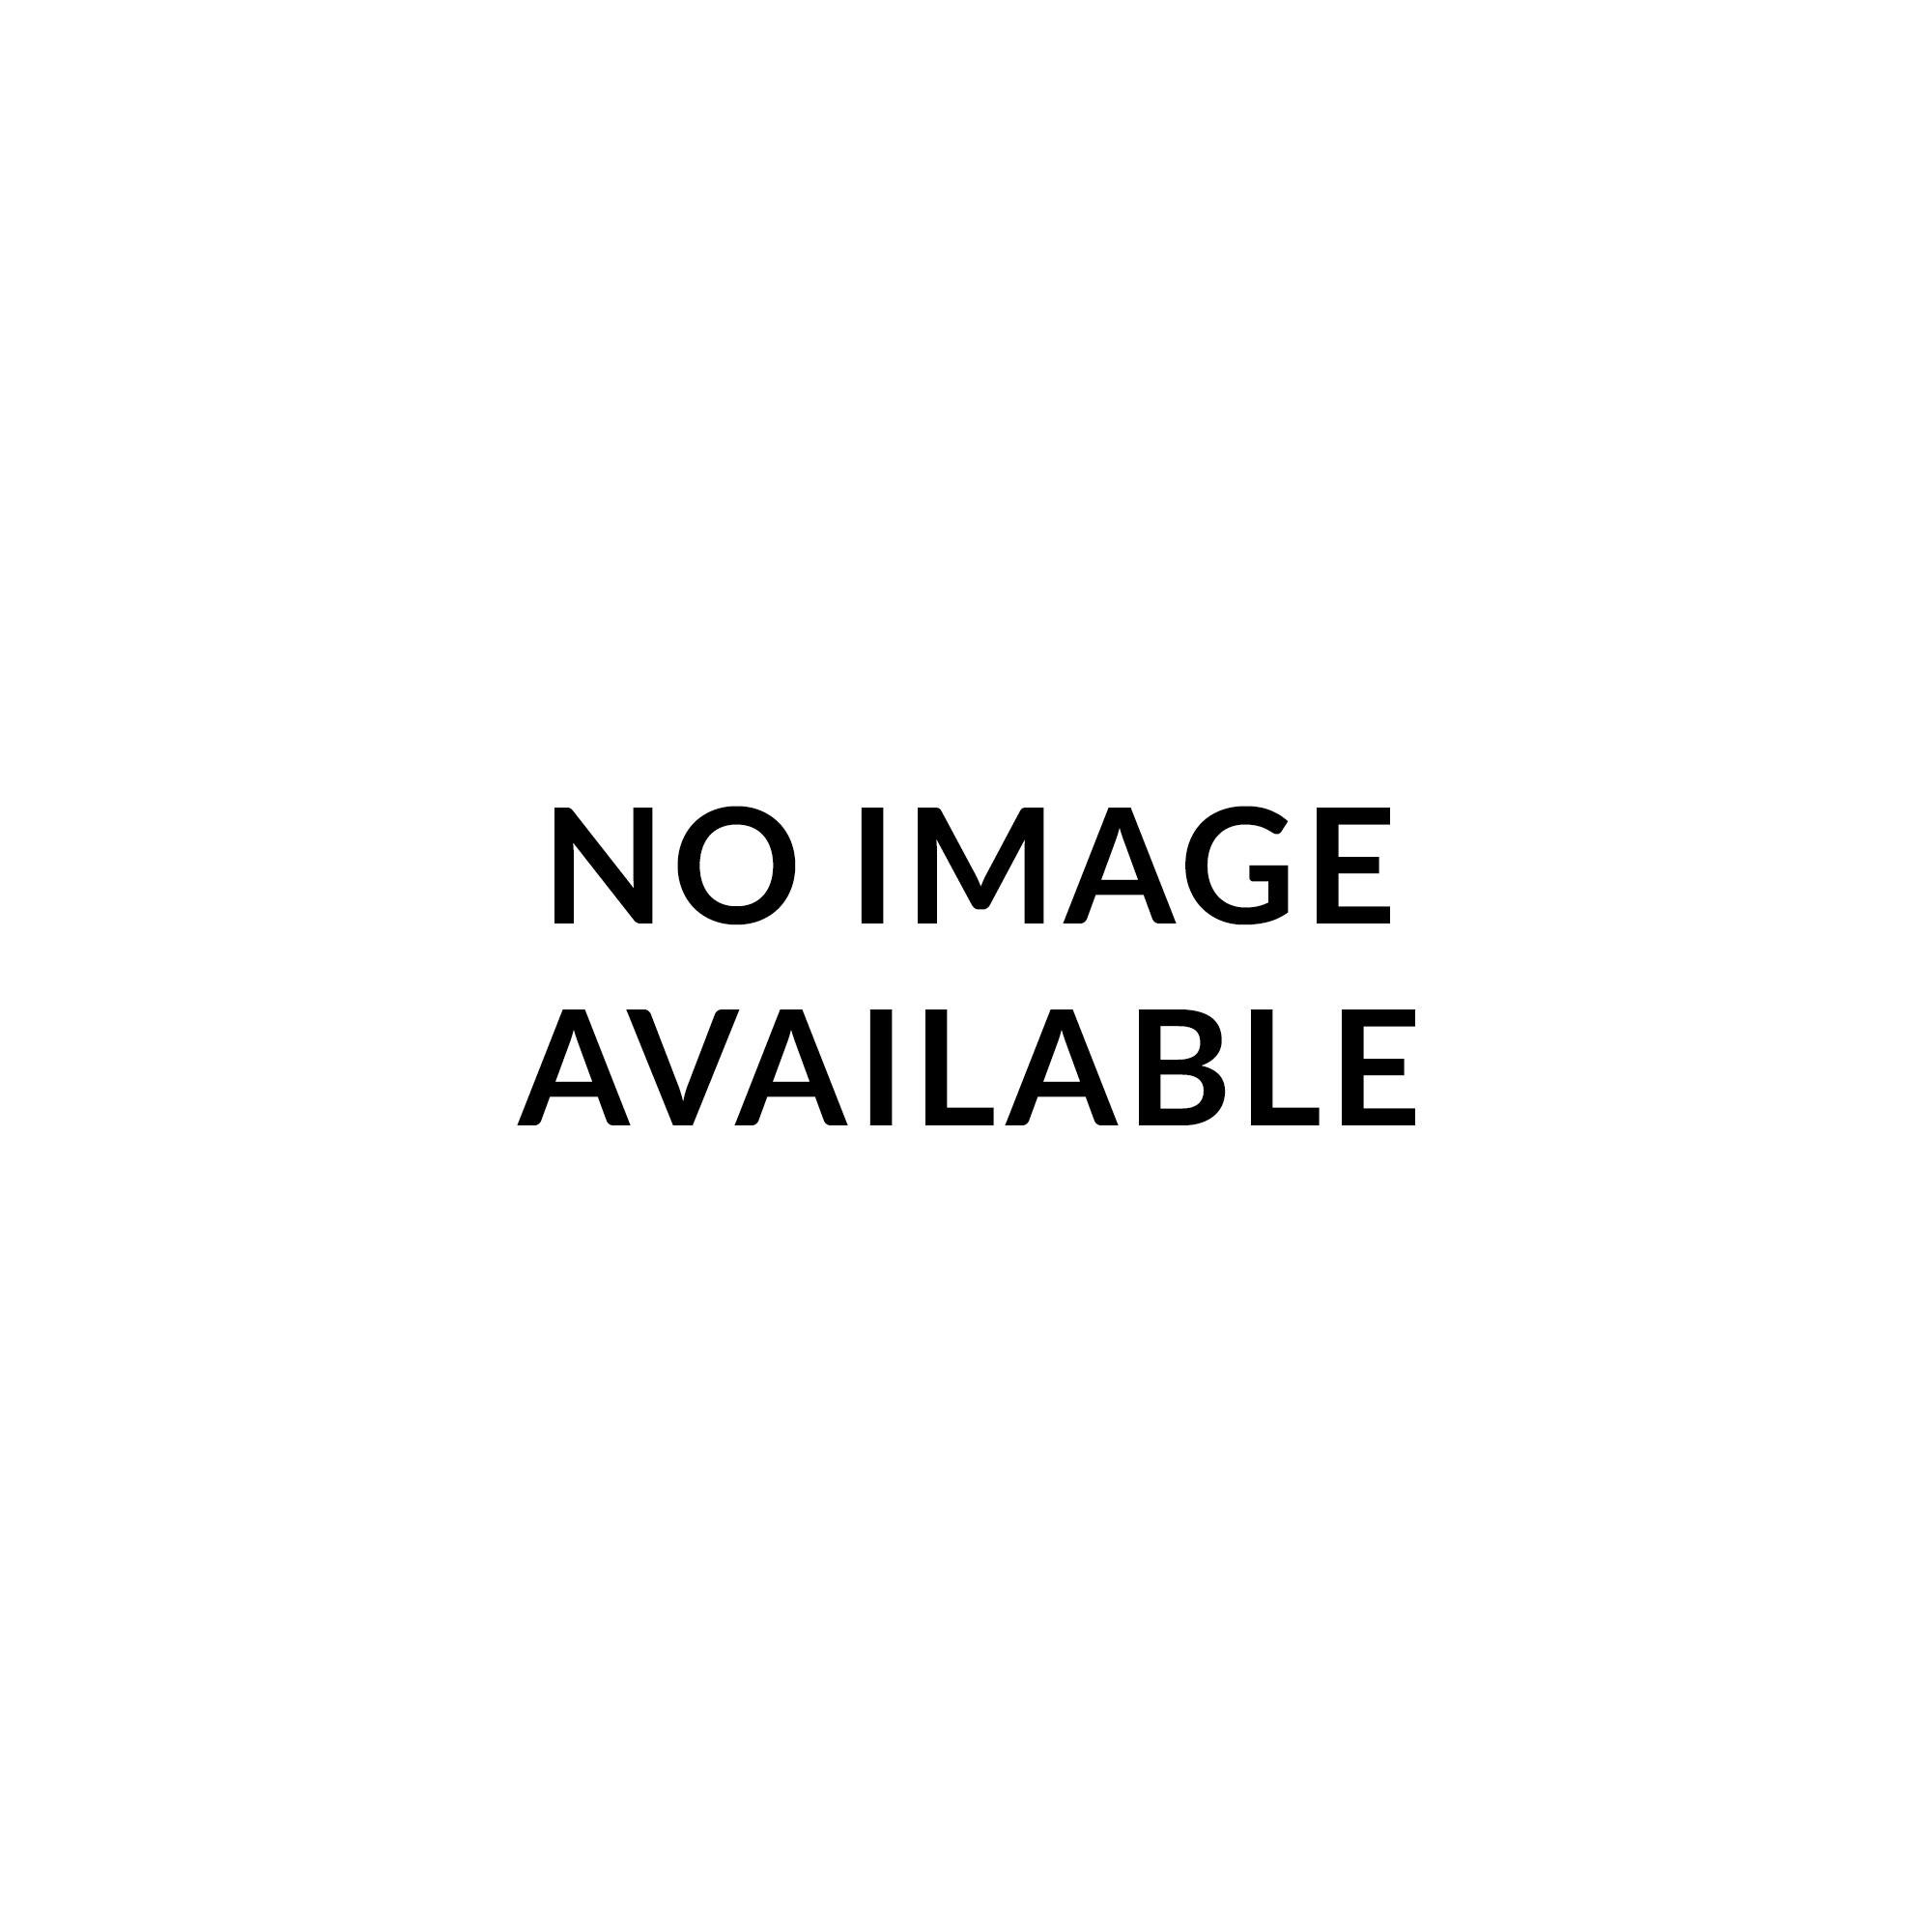 Gibson Pump Polish & Standard Polish Cloth Combo for Guitar Maintenance